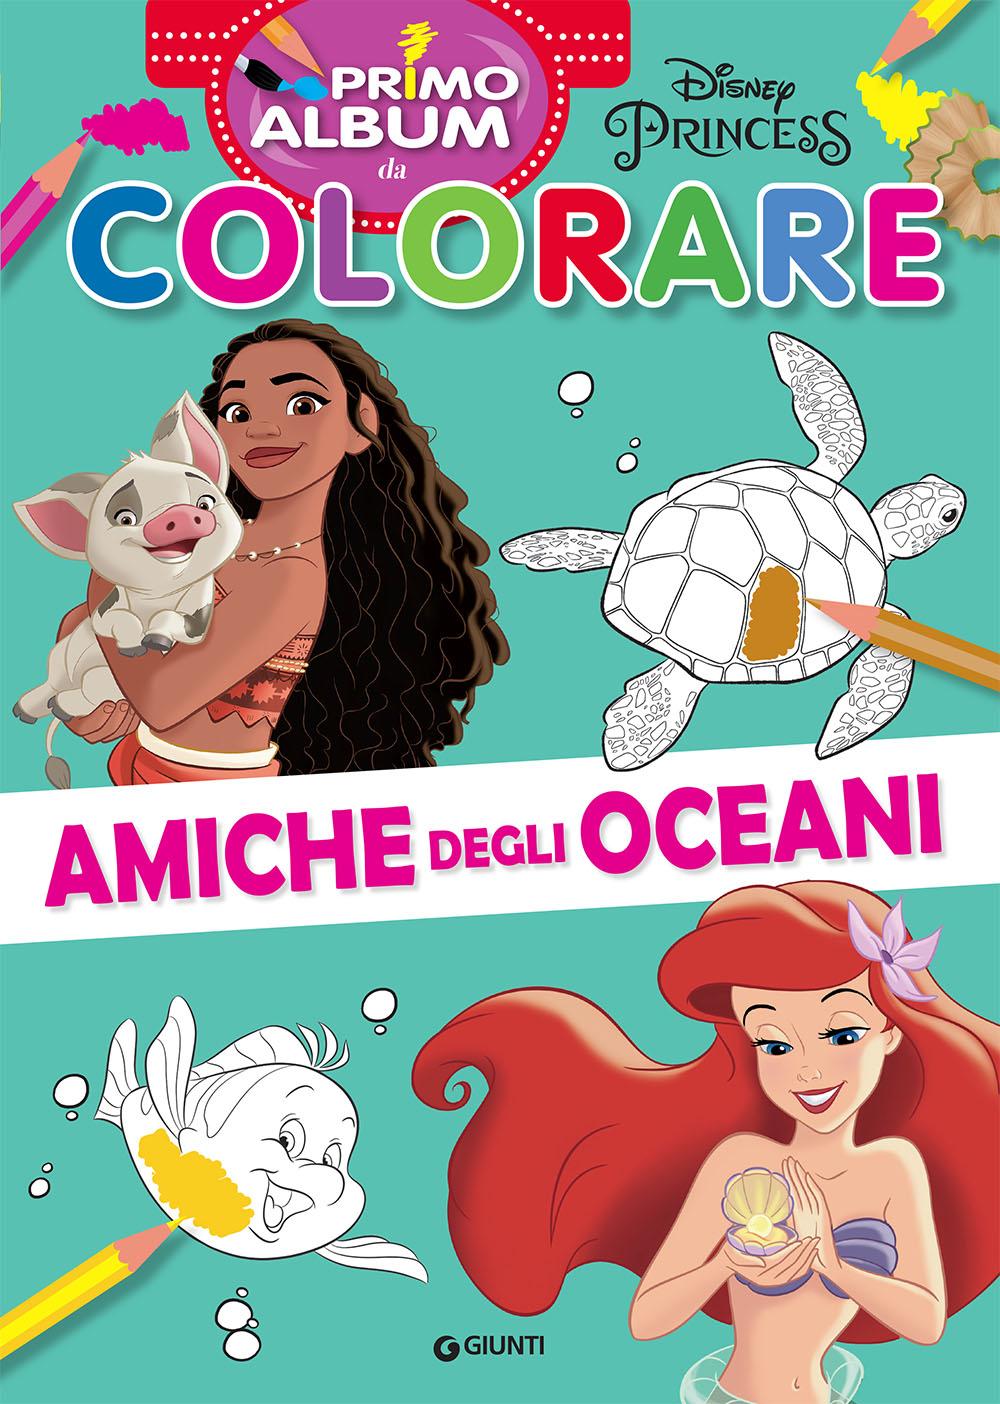 Primo album da colorare Disney Princess